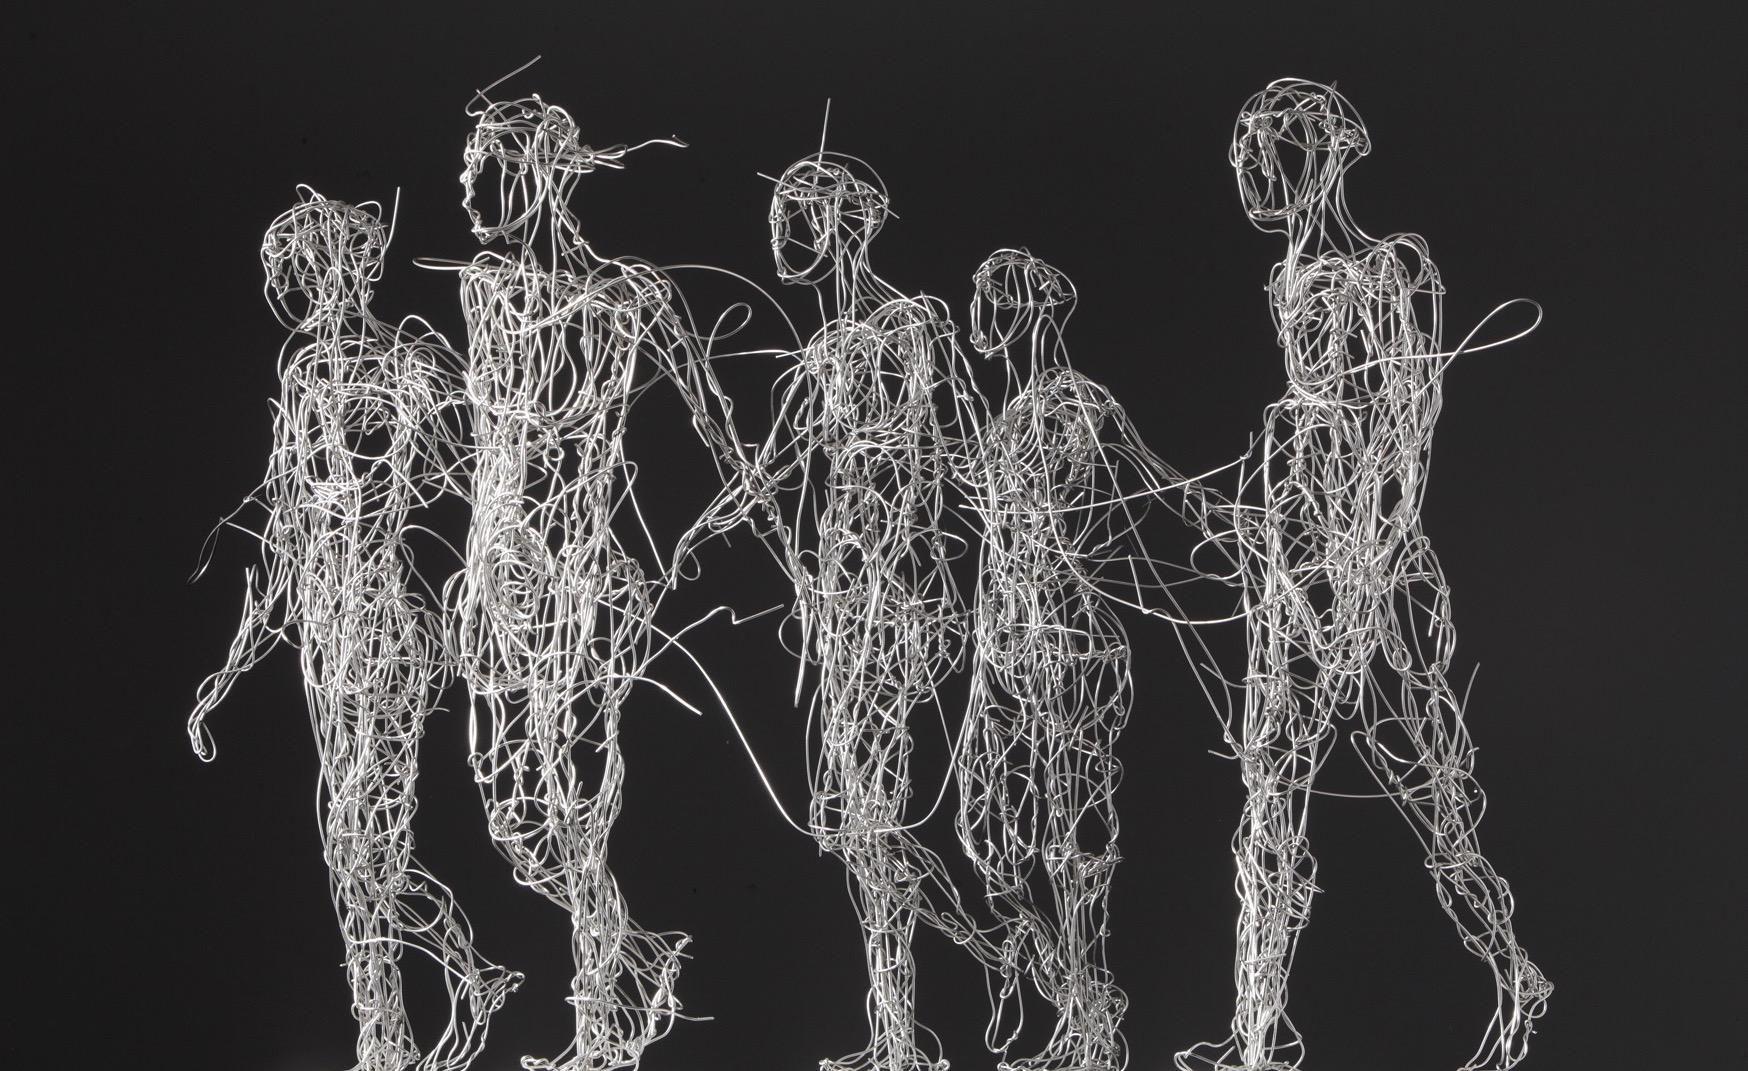 DrahtskulpturMenschenb Artwork by Stefanie Welk StefanieWelk